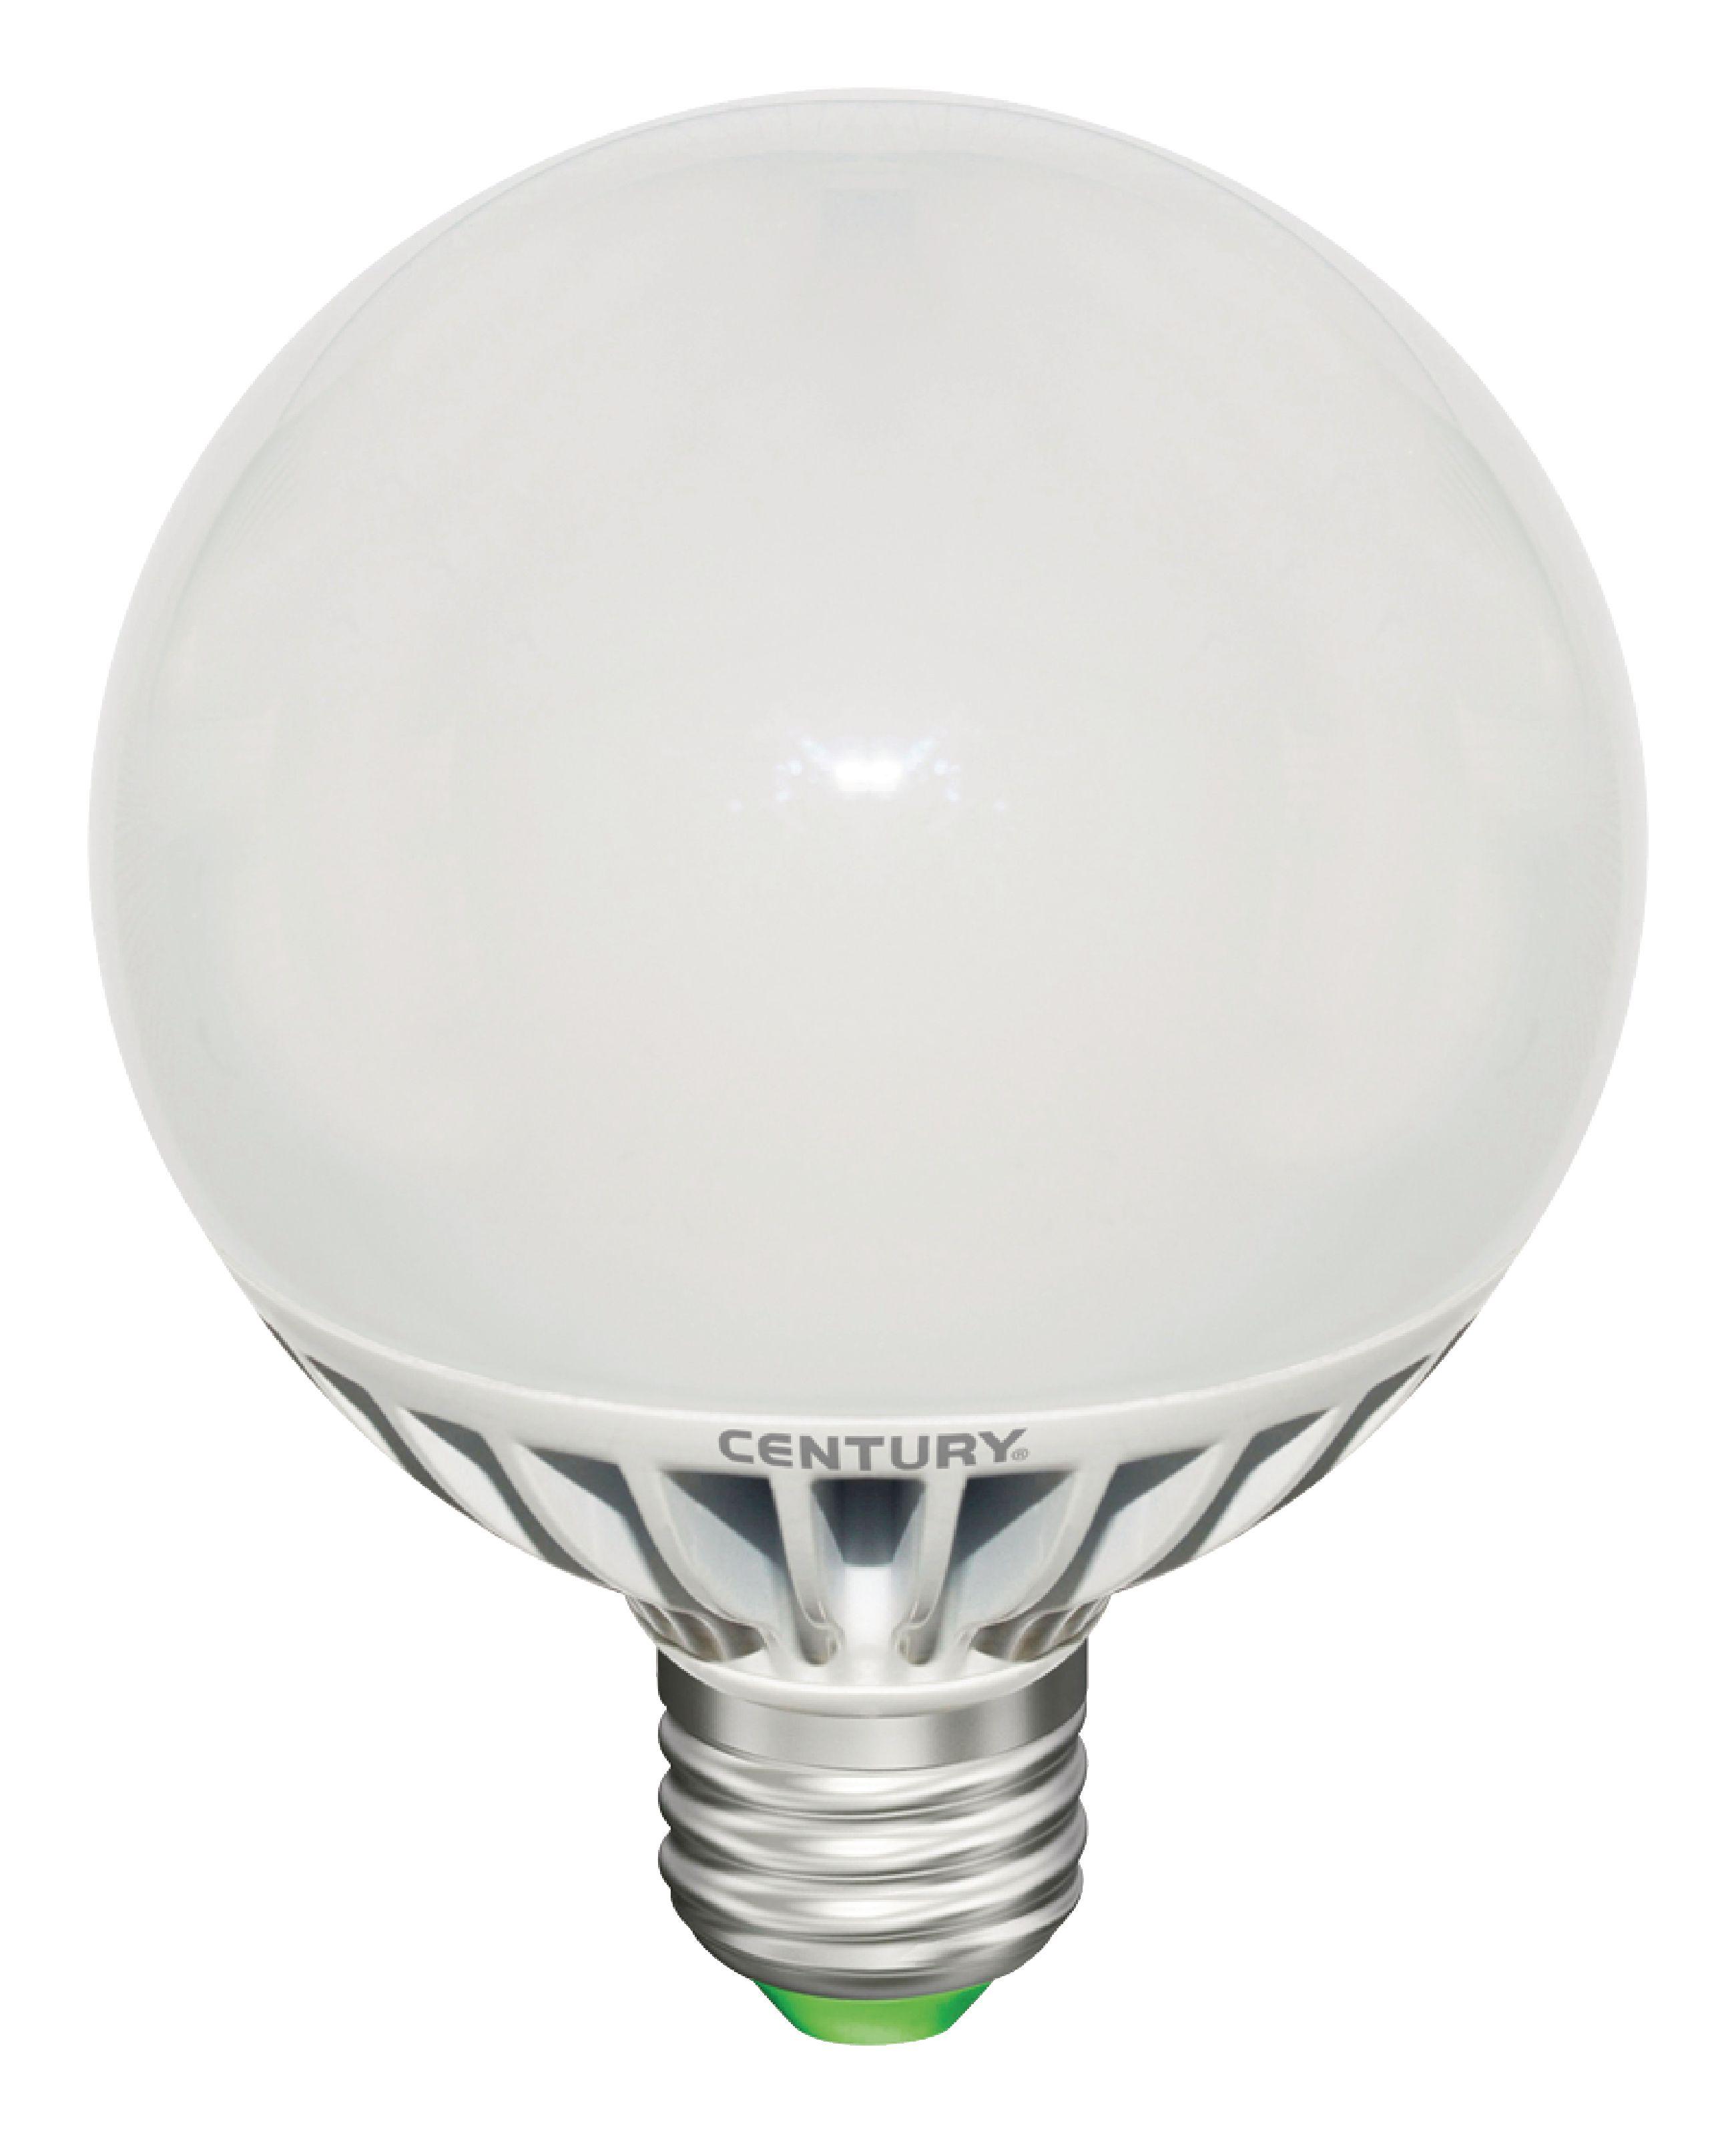 led-lampe-e27-globe-18-w-1710-lm-3000-k